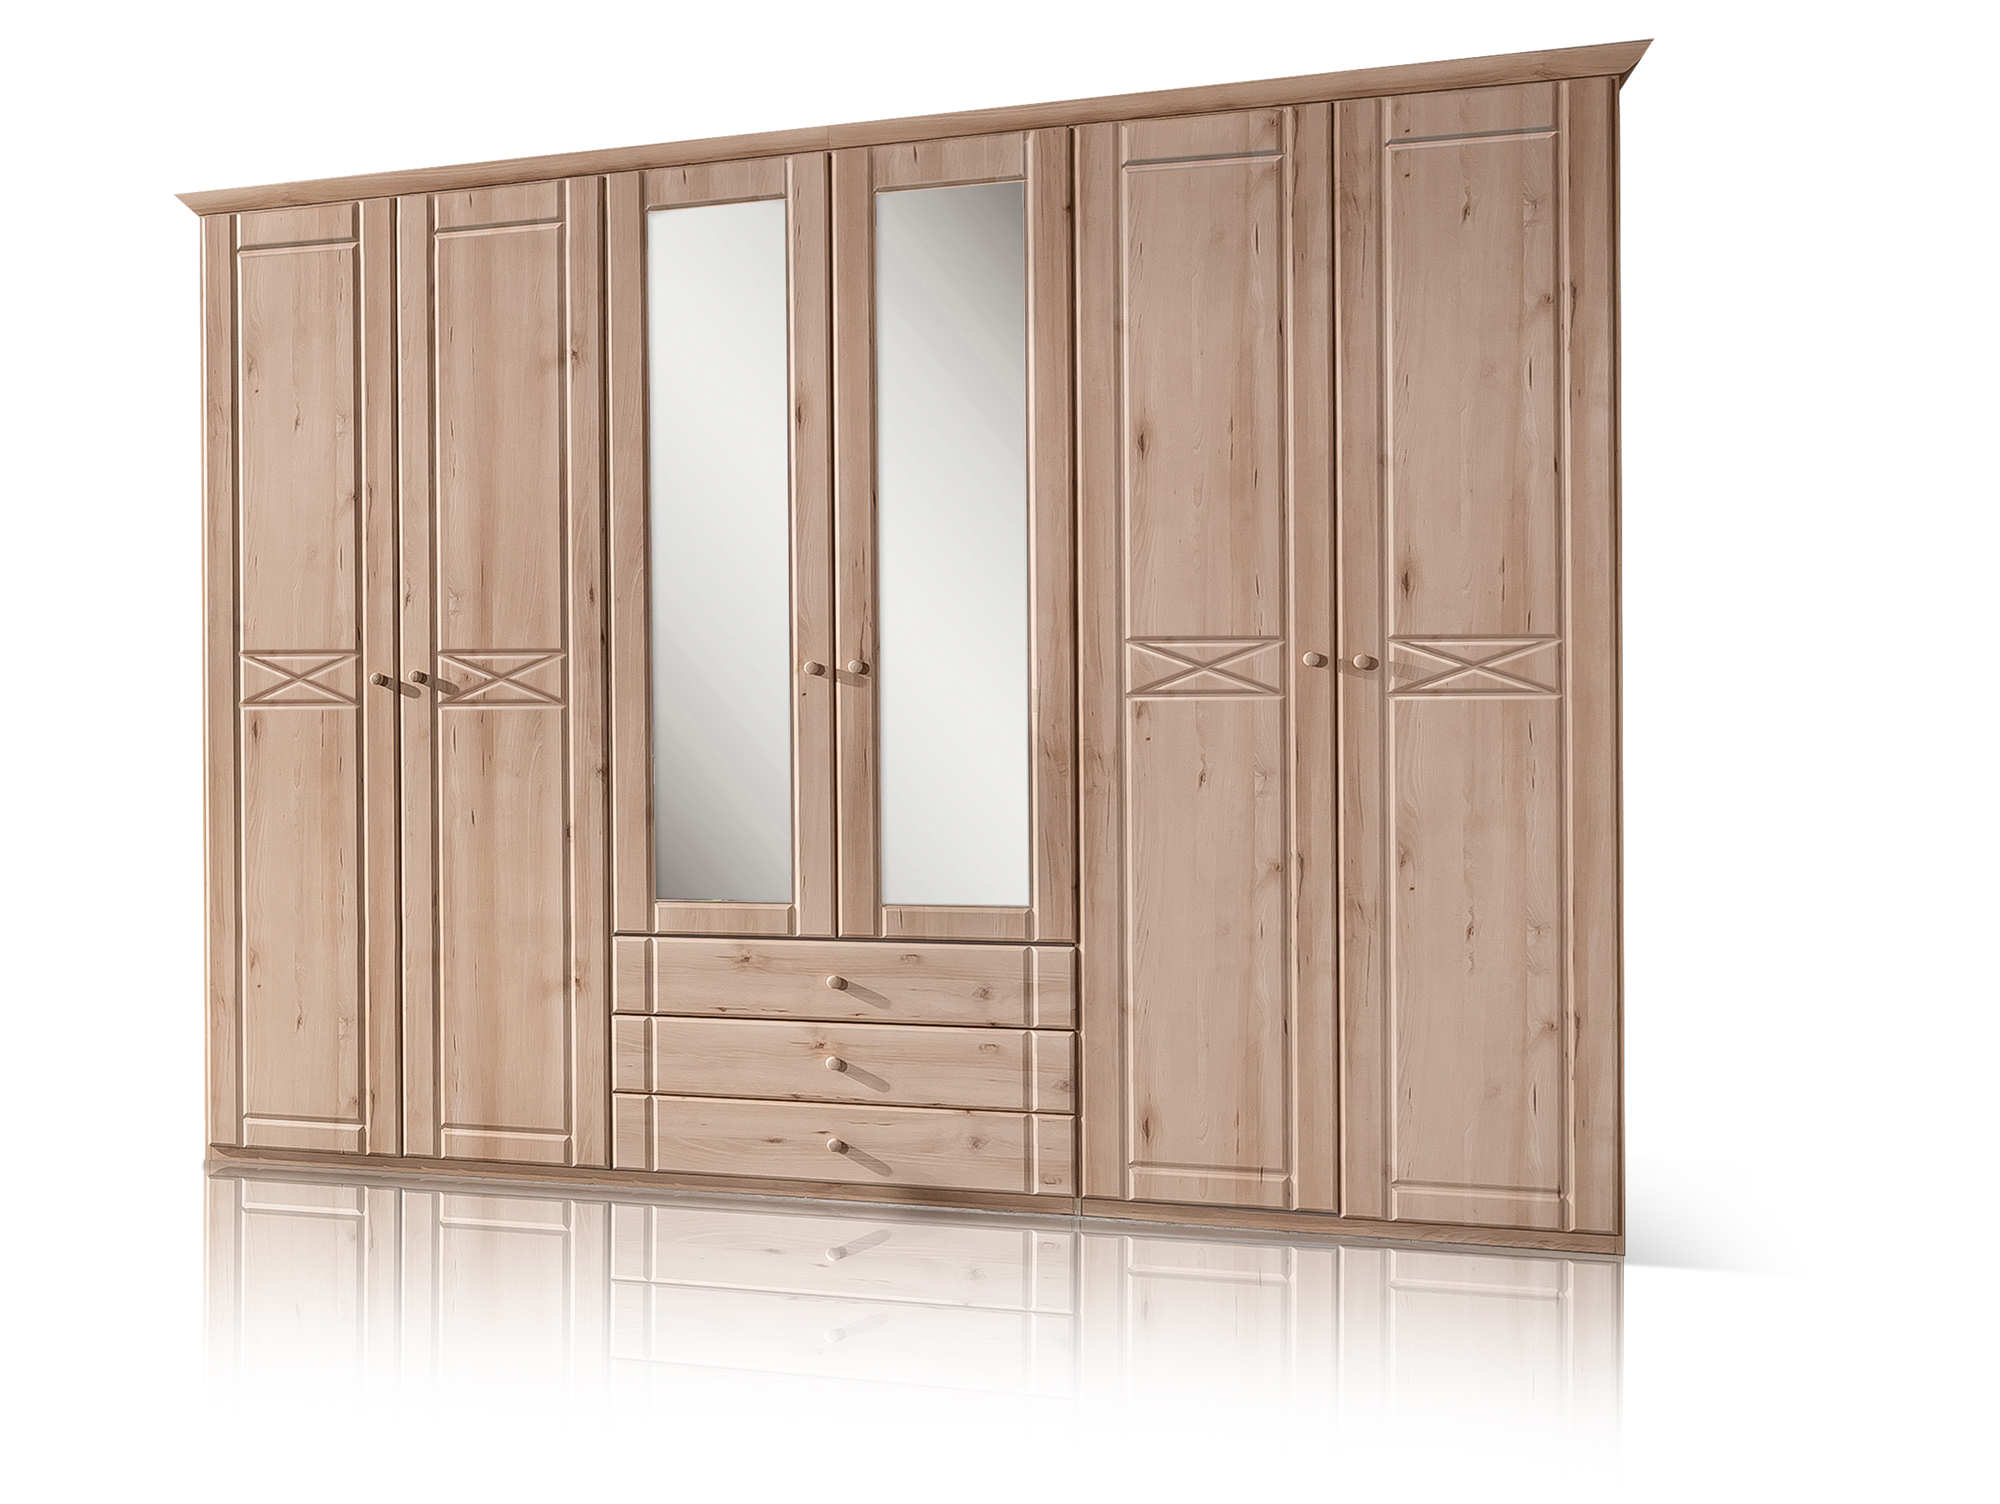 panama kleiderschrank 6trg edelbuche. Black Bedroom Furniture Sets. Home Design Ideas